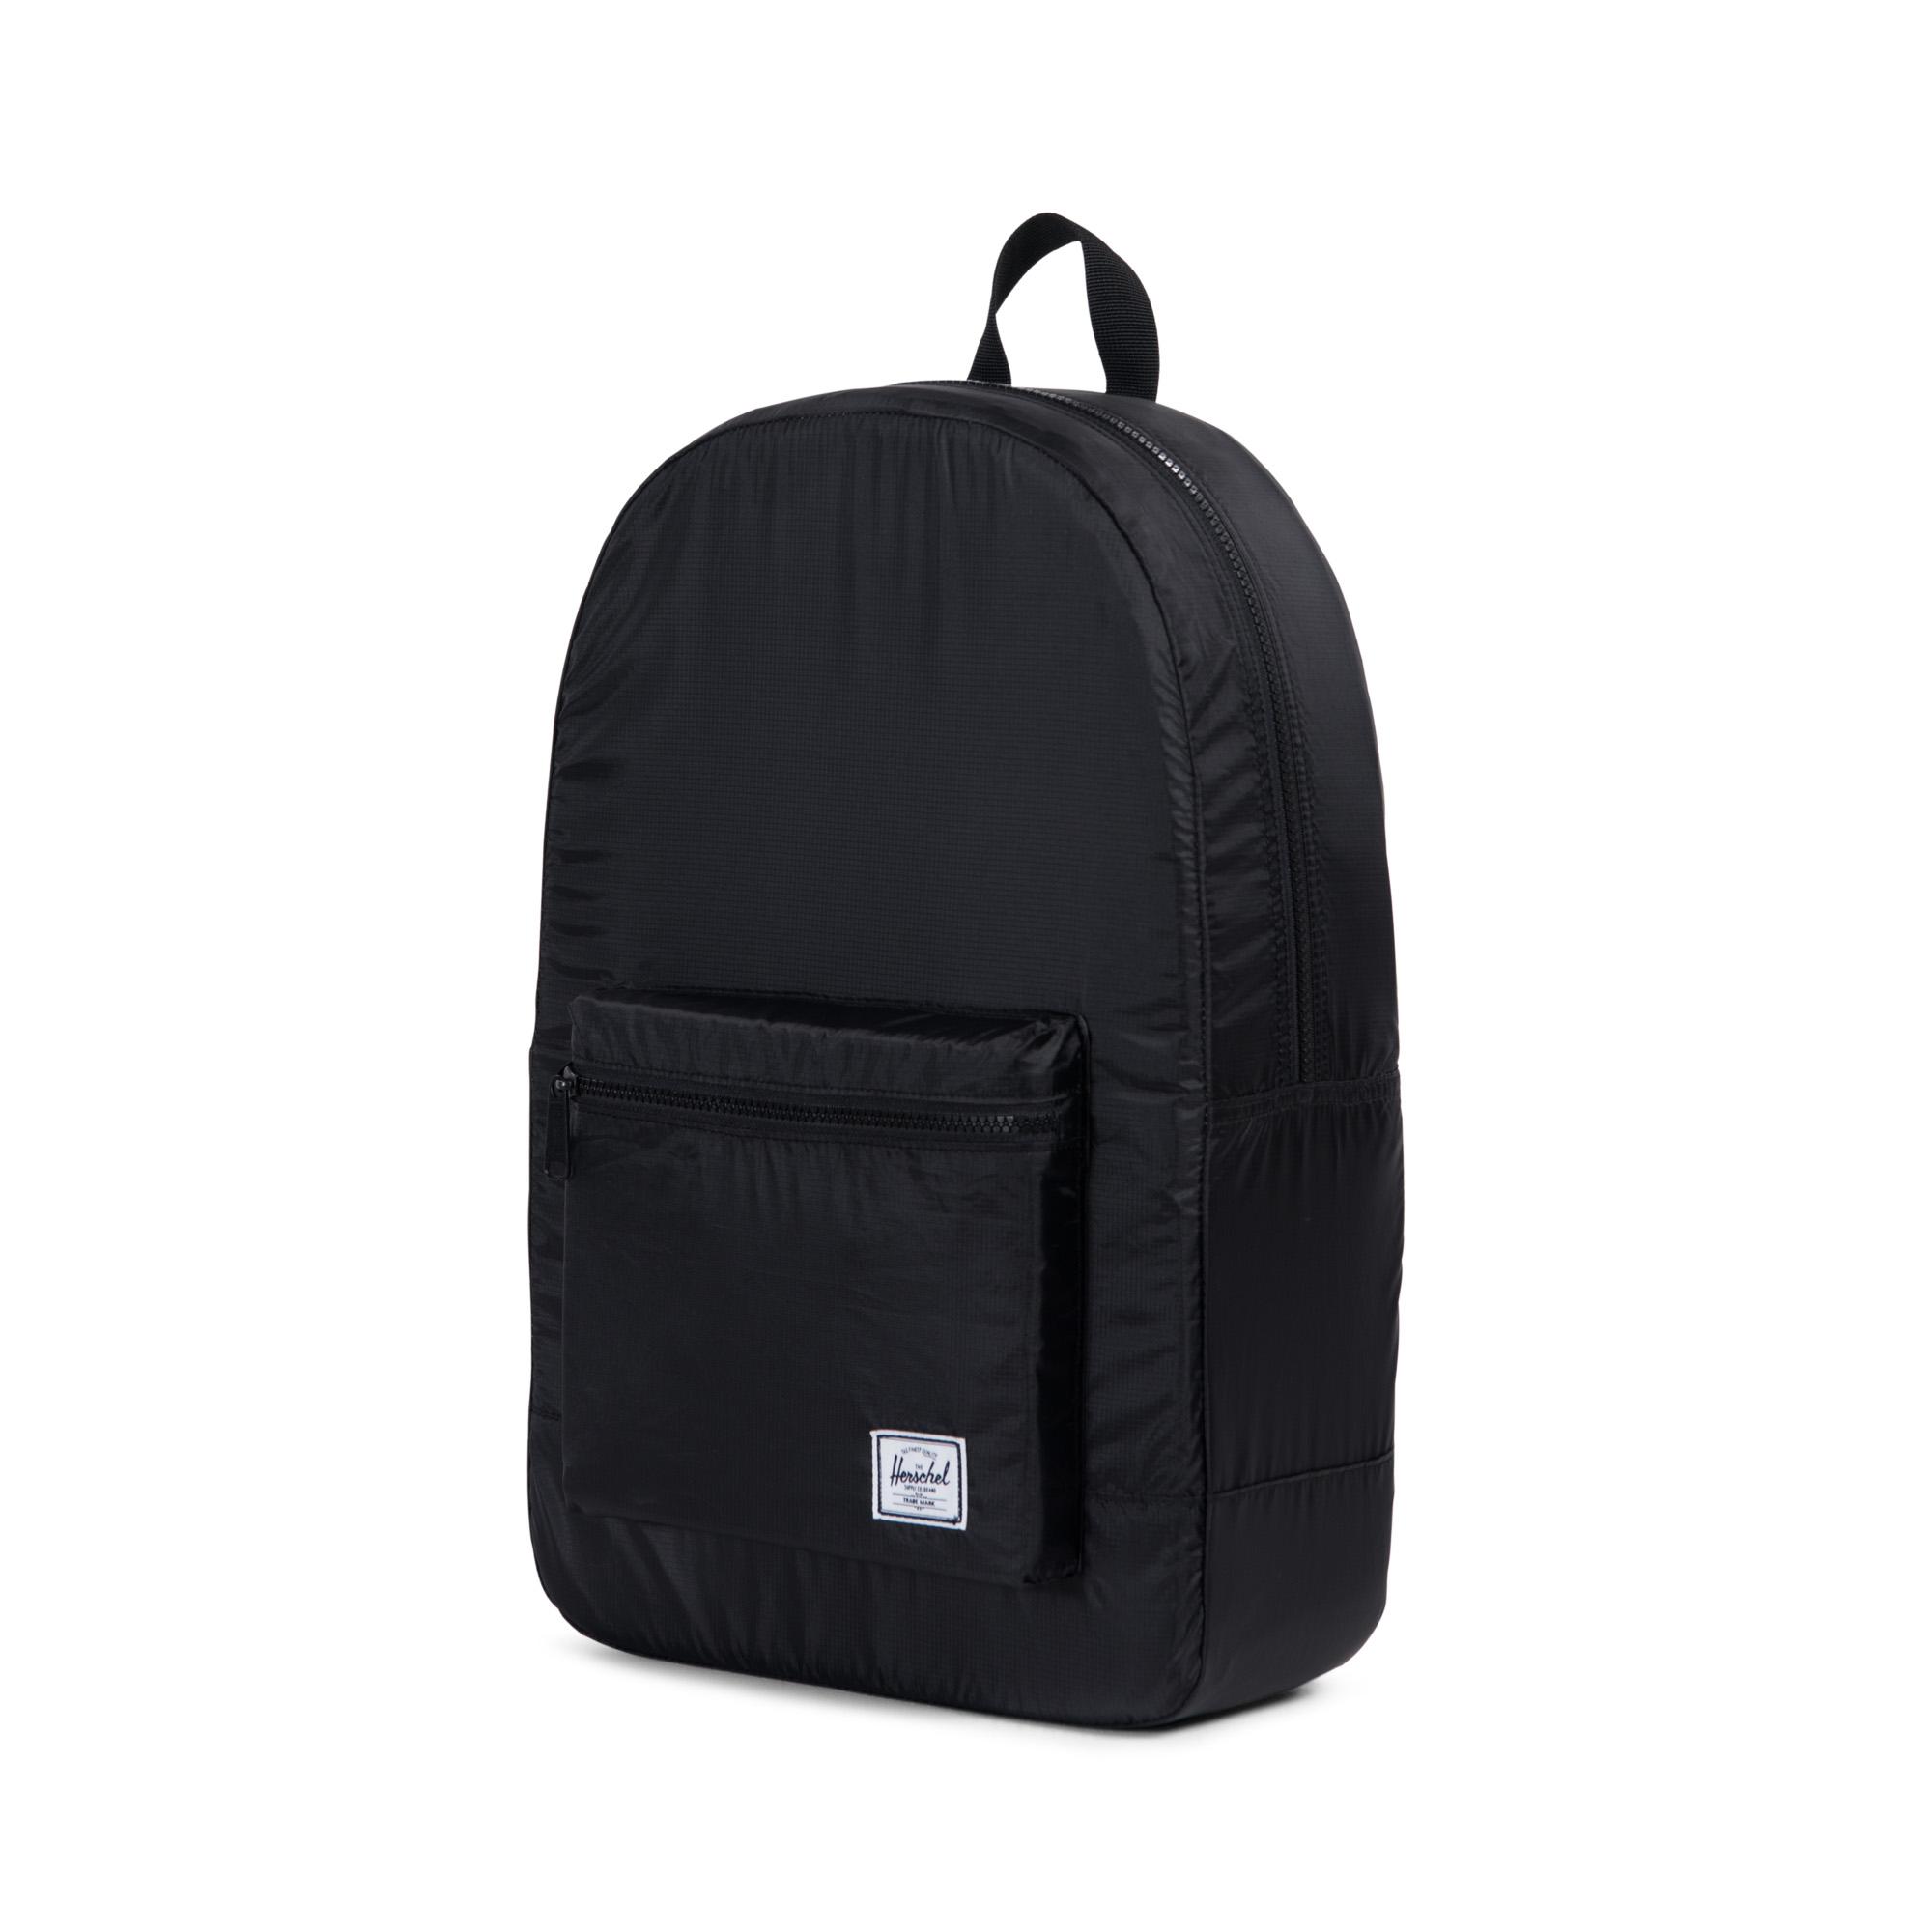 Daypack   Herschel Supply Company 9645a24185